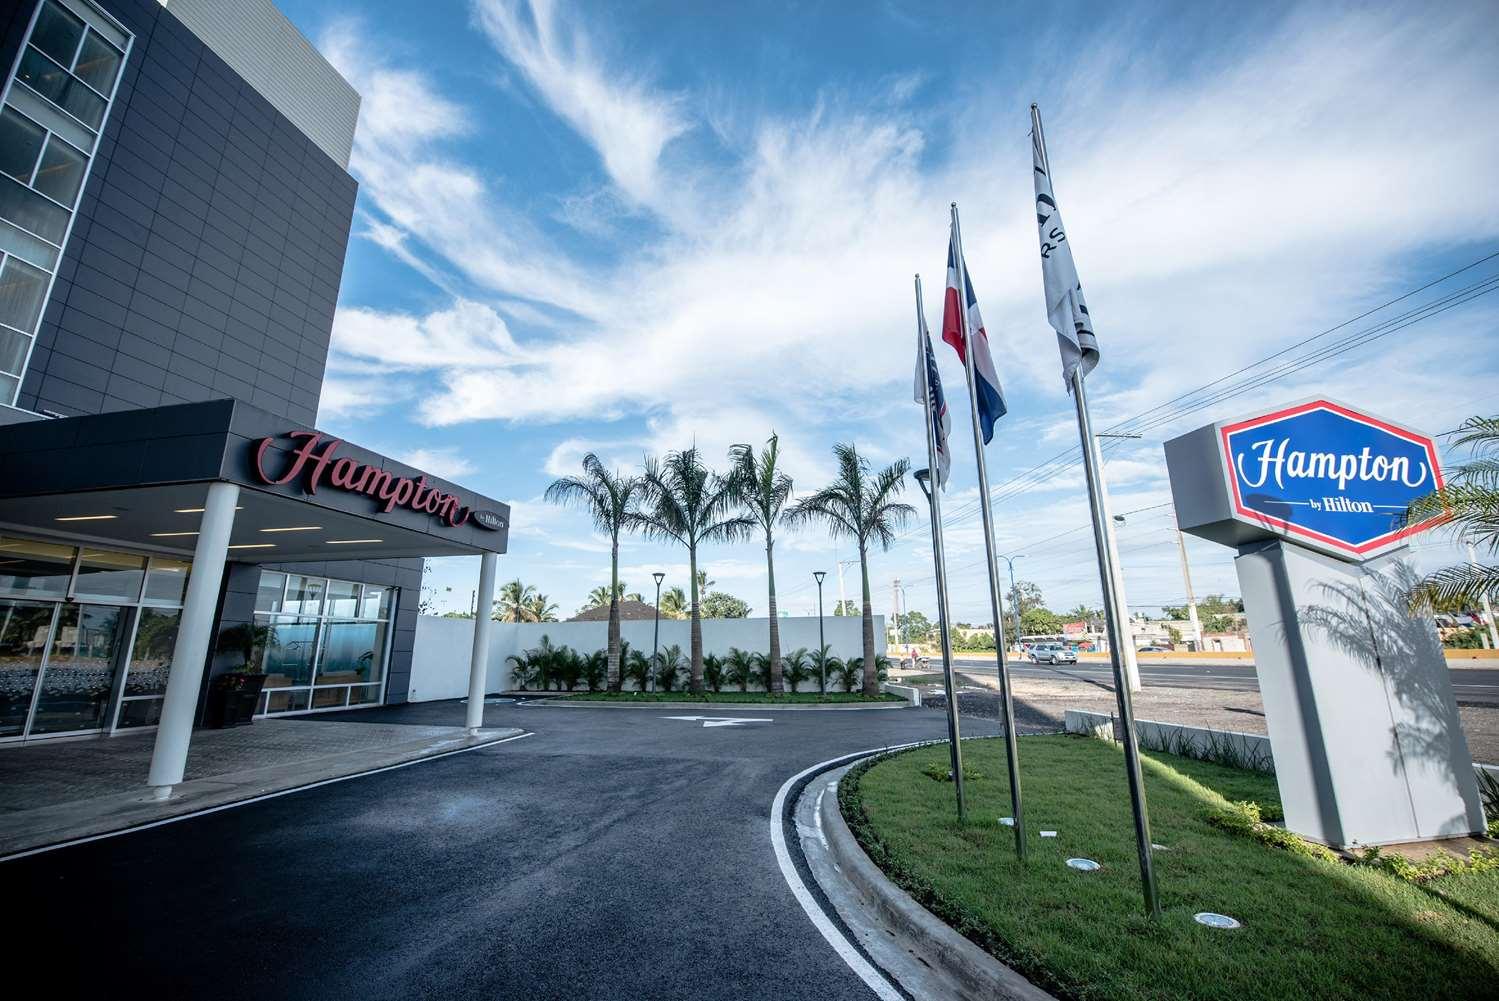 Hampton by Hilton Santo Domingo Airport